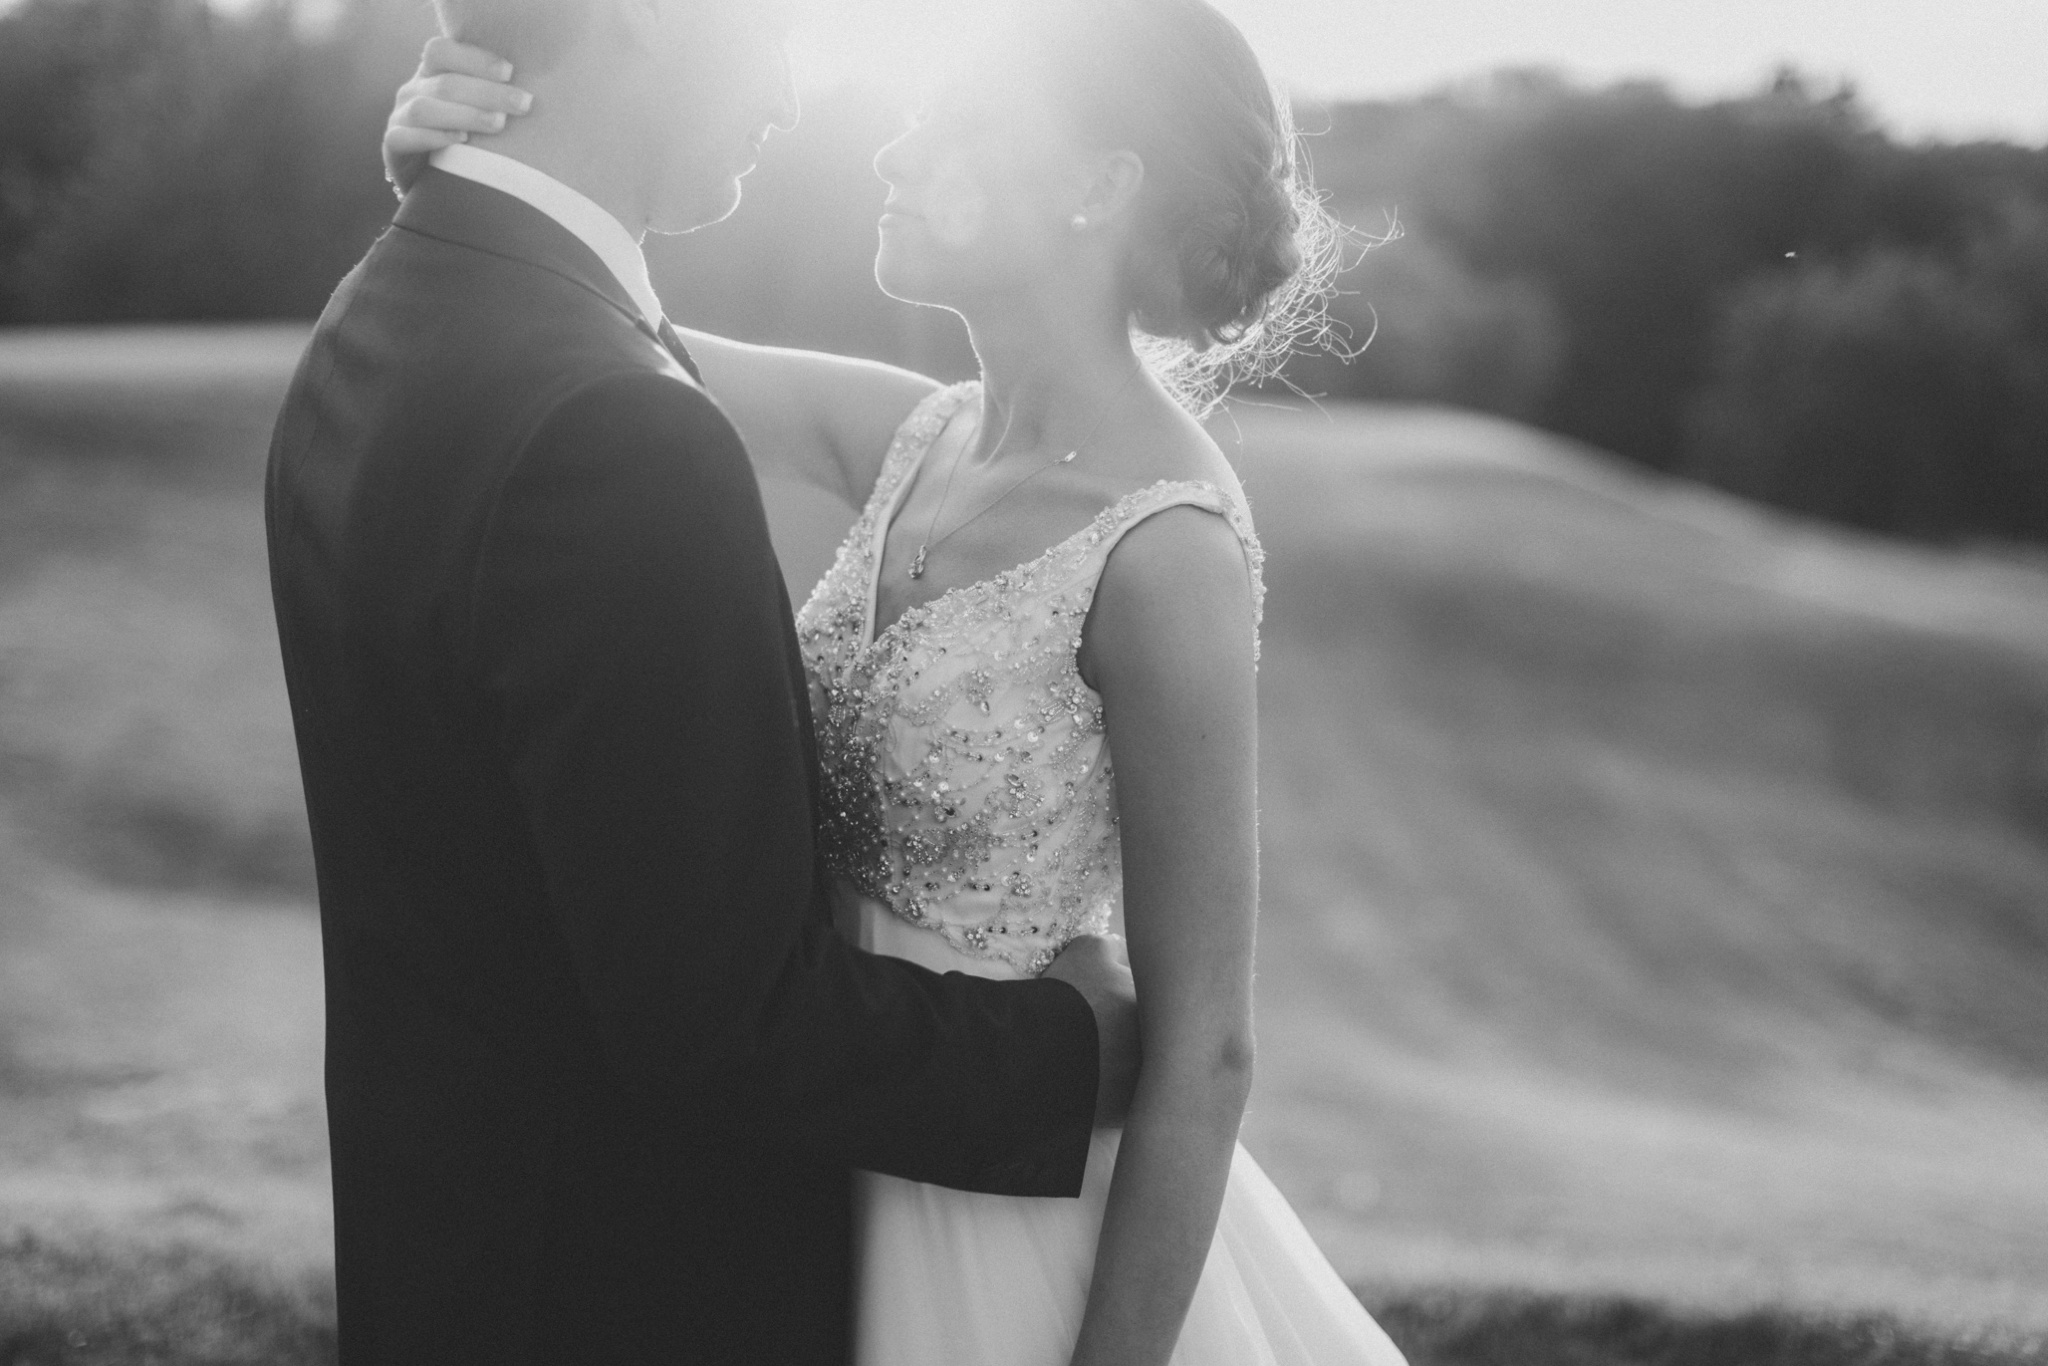 iowa-venue-fort-dodge-willow-ridge-golf-course-golden-hour-bride-groom-portraits